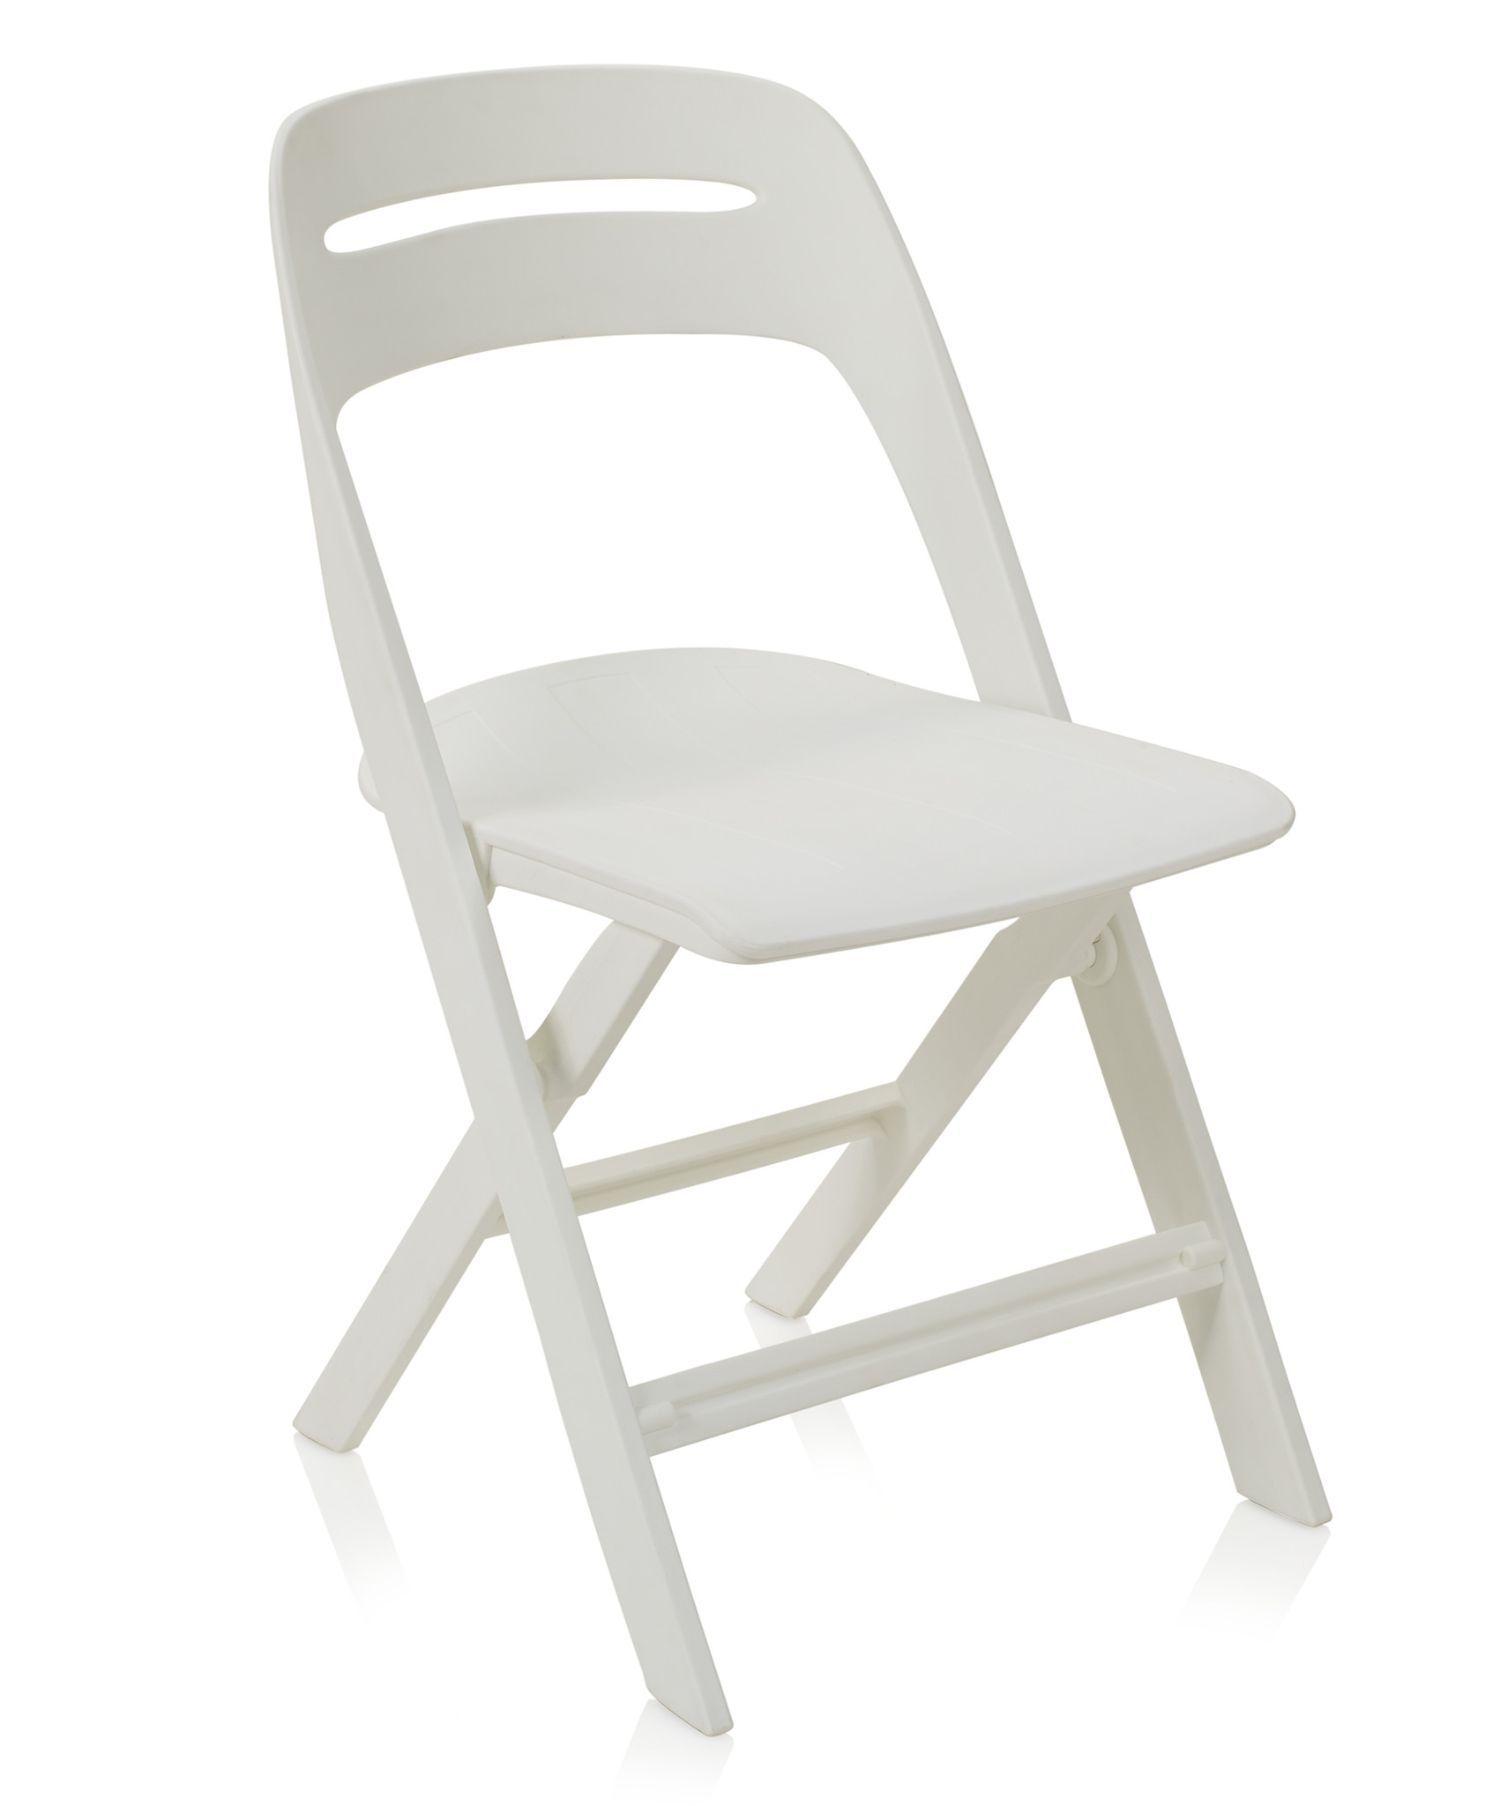 Novite Folding Chair Products KI Furniture Pinterest